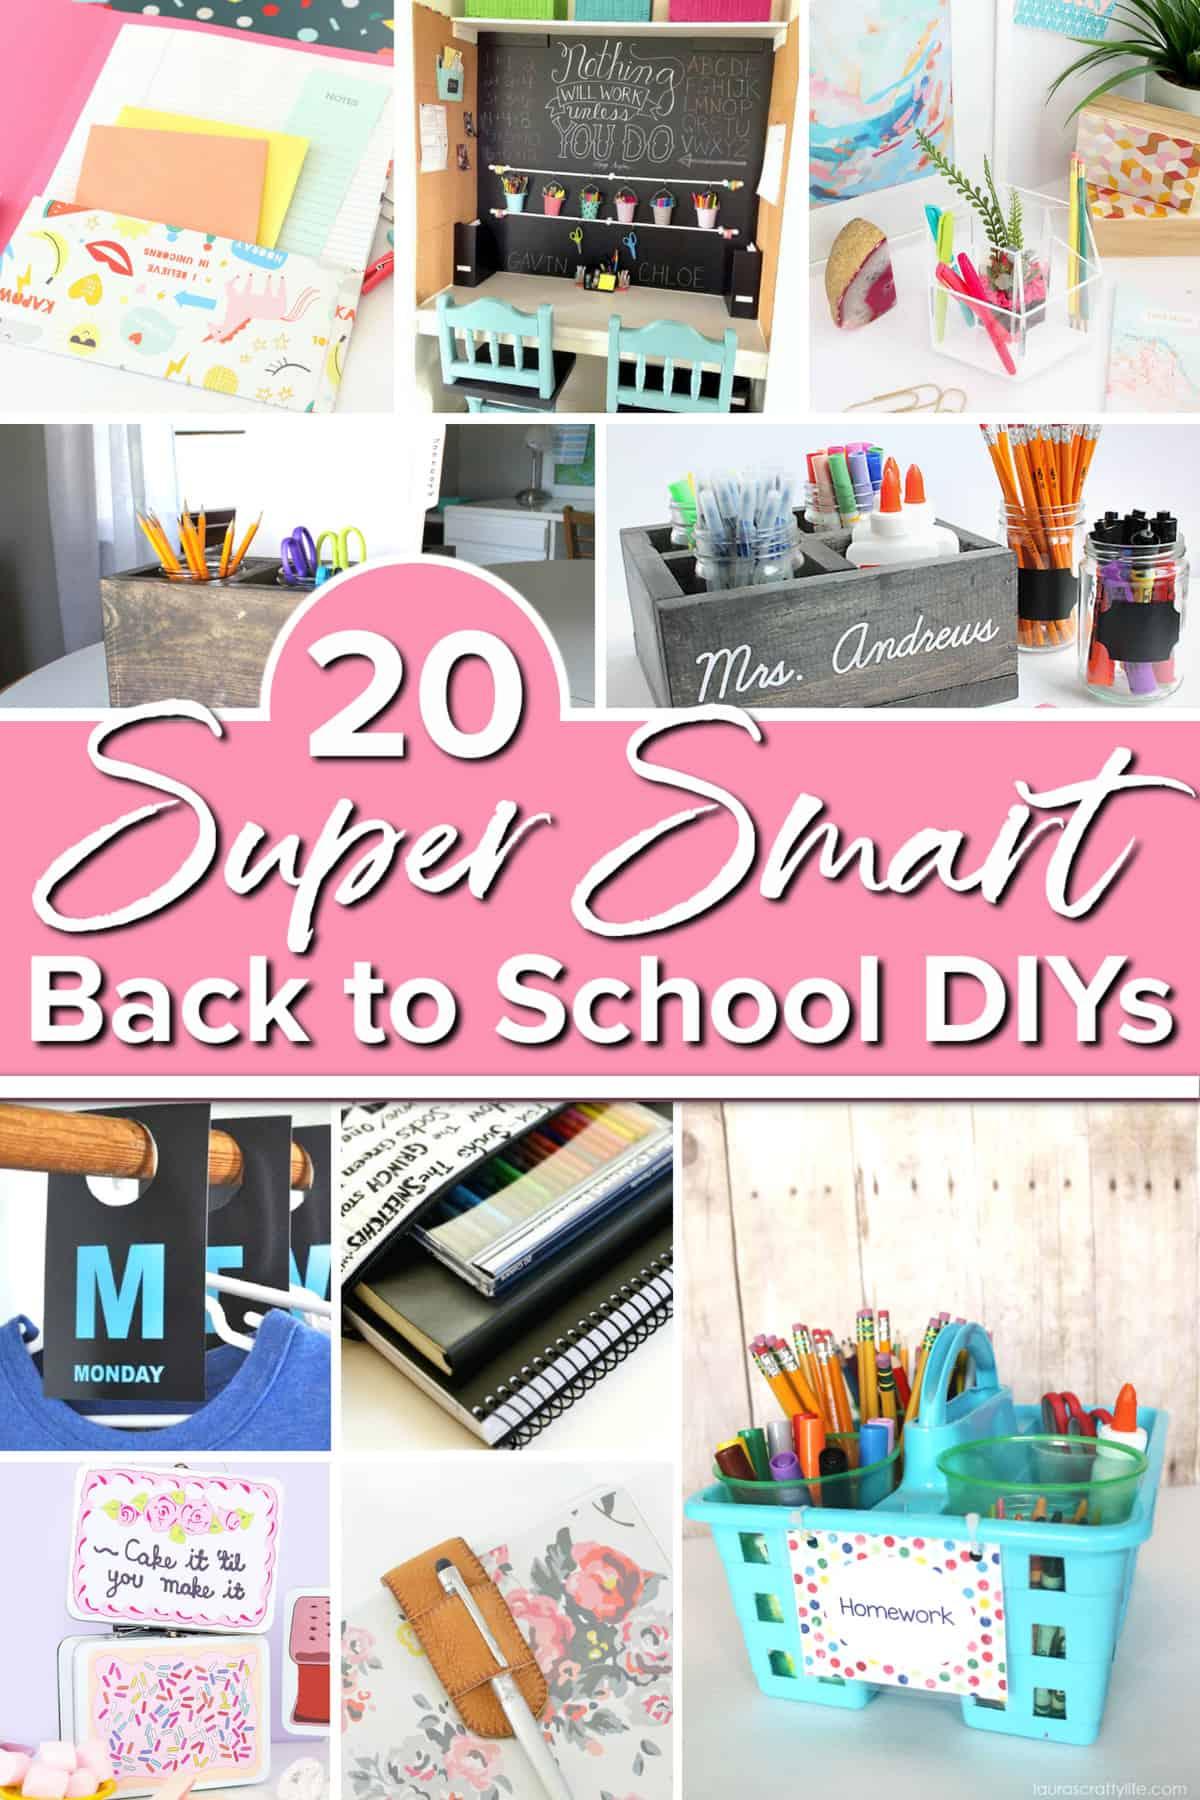 20 Super Smart Back to School DIYs